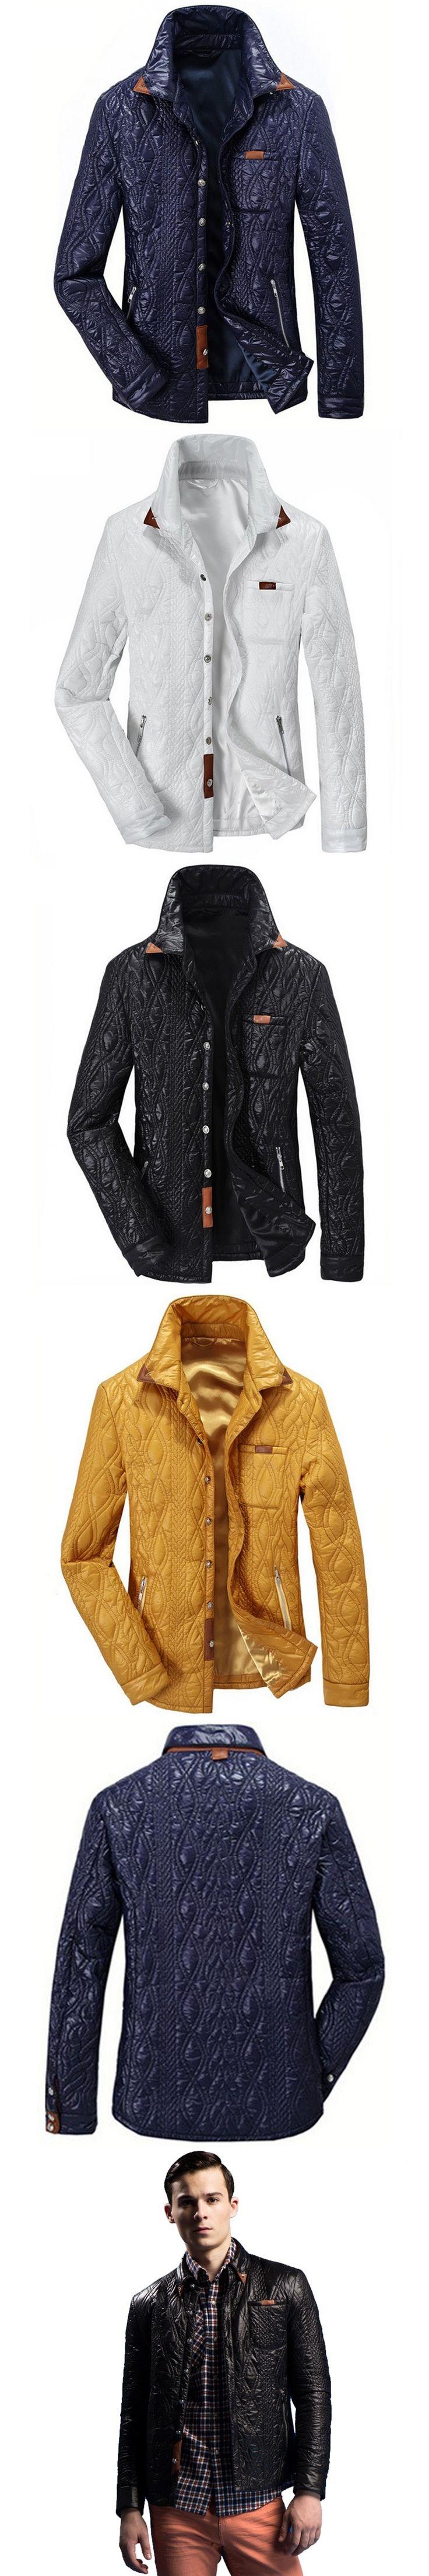 Brand New Winter Jacket Men Thin Warm Parka Mens Winter Jackets And Coats jaqueta masculino inverno Slim Fit Outwear Coat